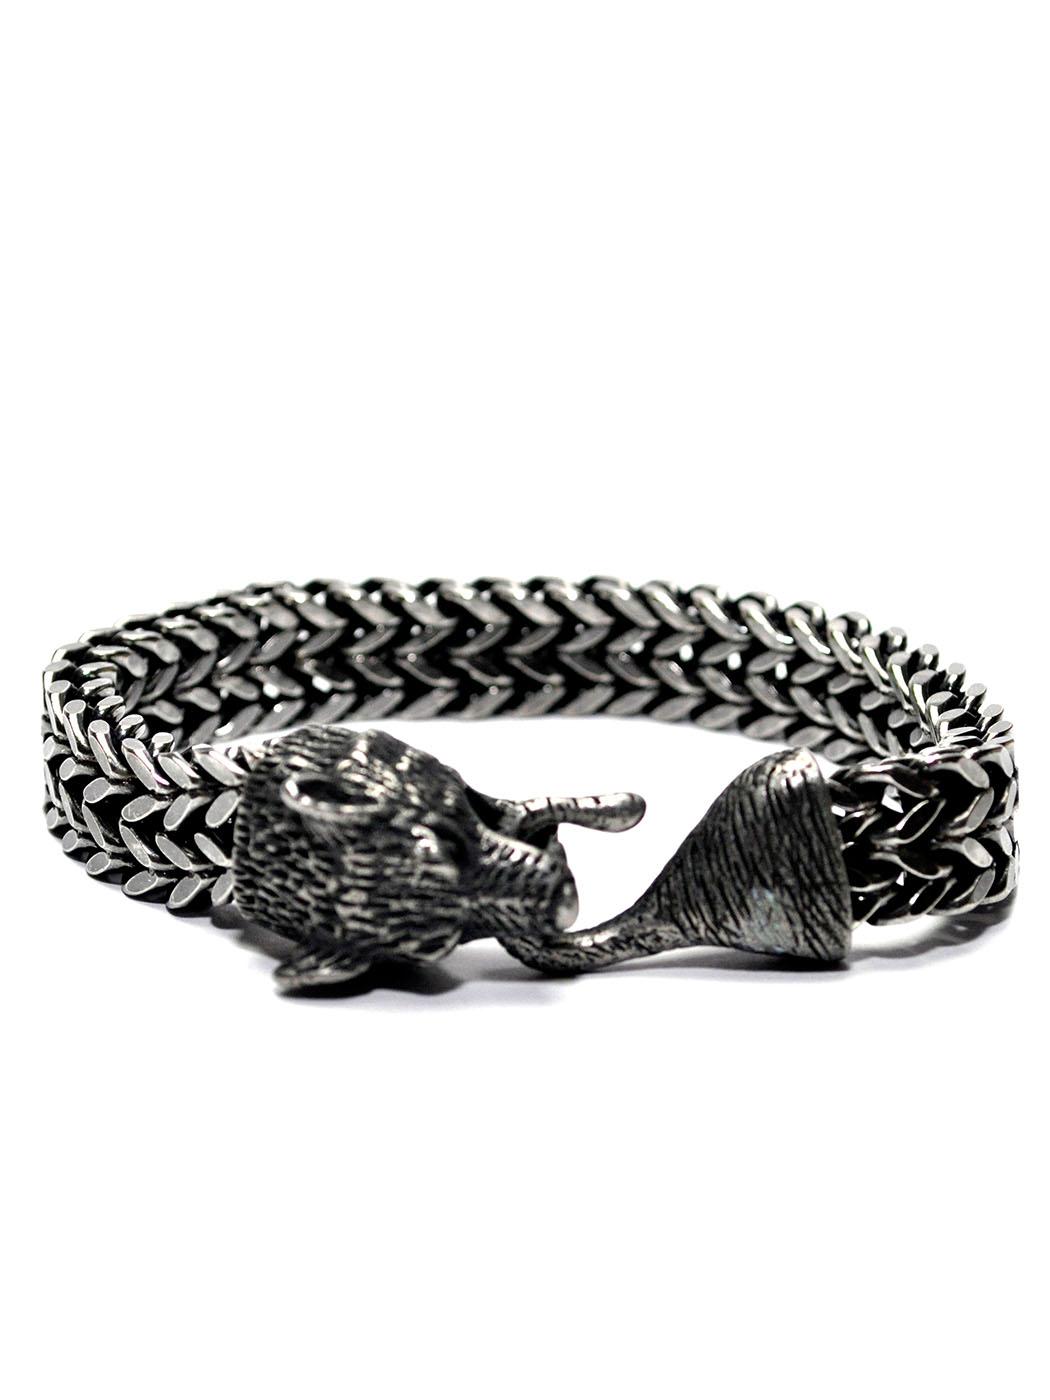 Wolf Wristband, Viking Bracelet, Nordic Bracelet, Ragnar Bracelet, Viking Arm Ring, Fenrir Bracelet, Viking Arm Cuff, Nordic Arm Band, Mjolnir Bracelet, Viking Wristband, Nordic Arm Bands, Valknut Bracelet, Ragnars Bracelet, Werewolf Bracelet, Arm Ring Bracelet, Wolf Bracelet Mens, Wolf Head Bracelet, Mens Torc Bracelet, Wolf Bead Bracelet, Athelstan Bracelet, Gold Wolf Bracelet, Viking Axe Bracelet, Wolf Charm Bracelet, Viking Arm Bracelet, Viking Leather Cuff, Wolf Slave Bracelet, Jormungandr Armband, Wolf Tooth Bracelet, Norse Rune Bracelet,